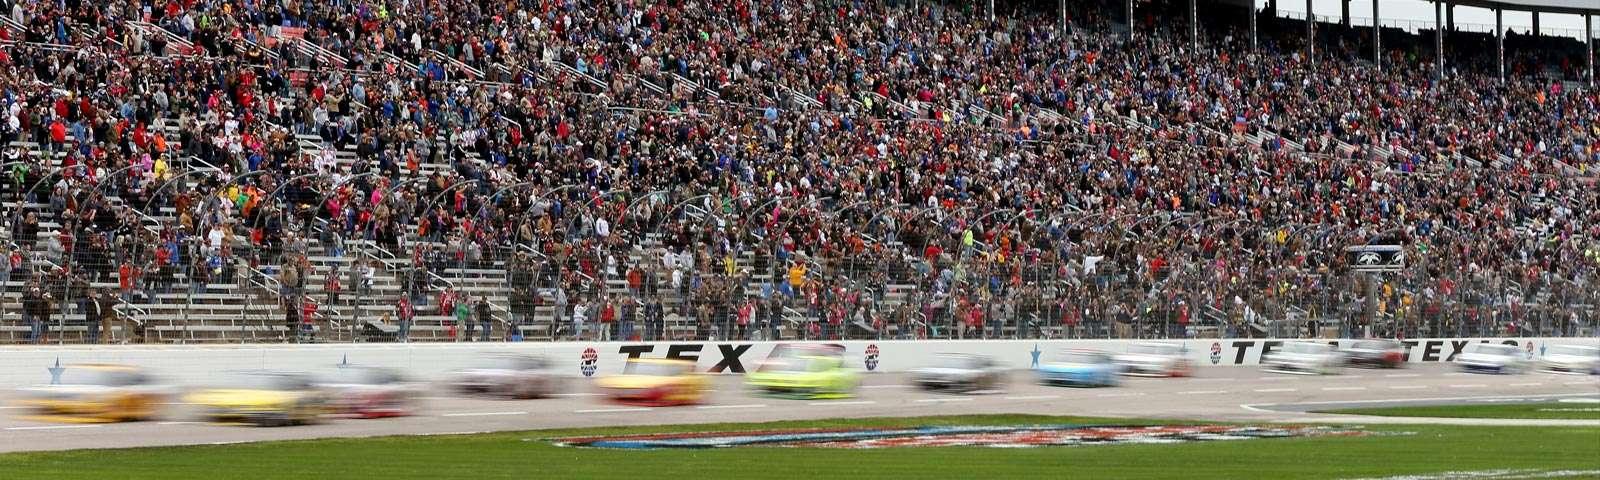 Texas Motor Speedway Fort Worth Motorsports